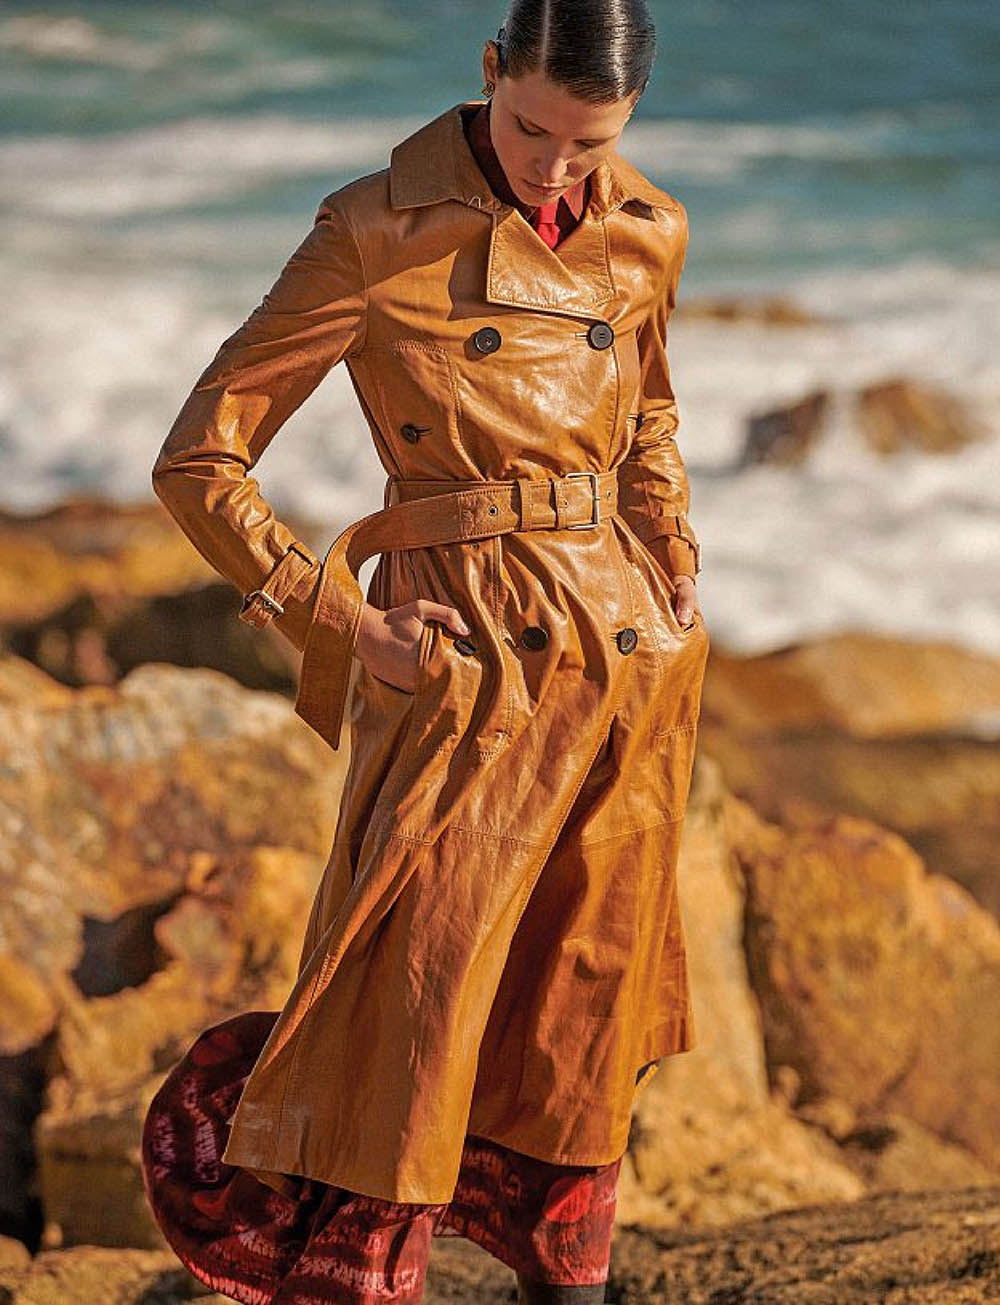 Sara Soric by Frederico Martins for Amica Magazine September 2020